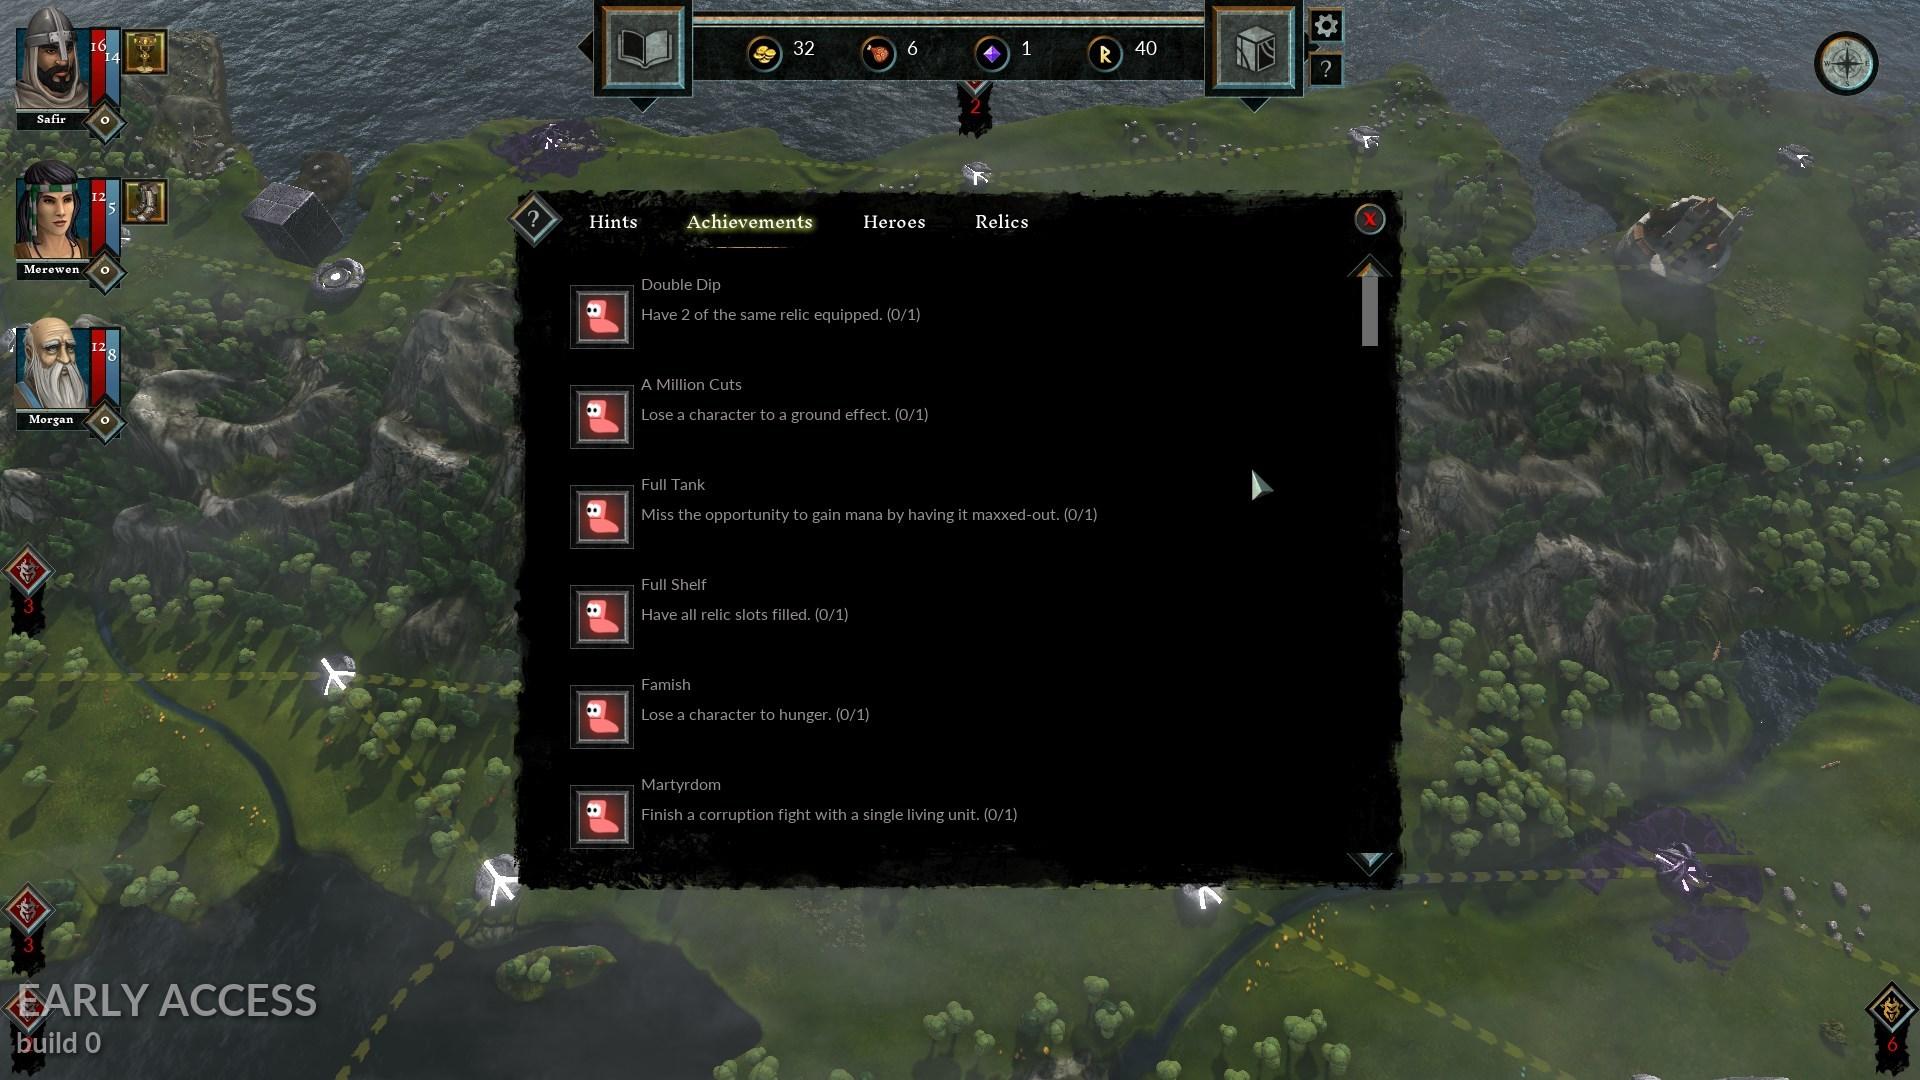 615c590f208021ca17931dba0a7b114acd3ceed4 | RPG Jeuxvidéo